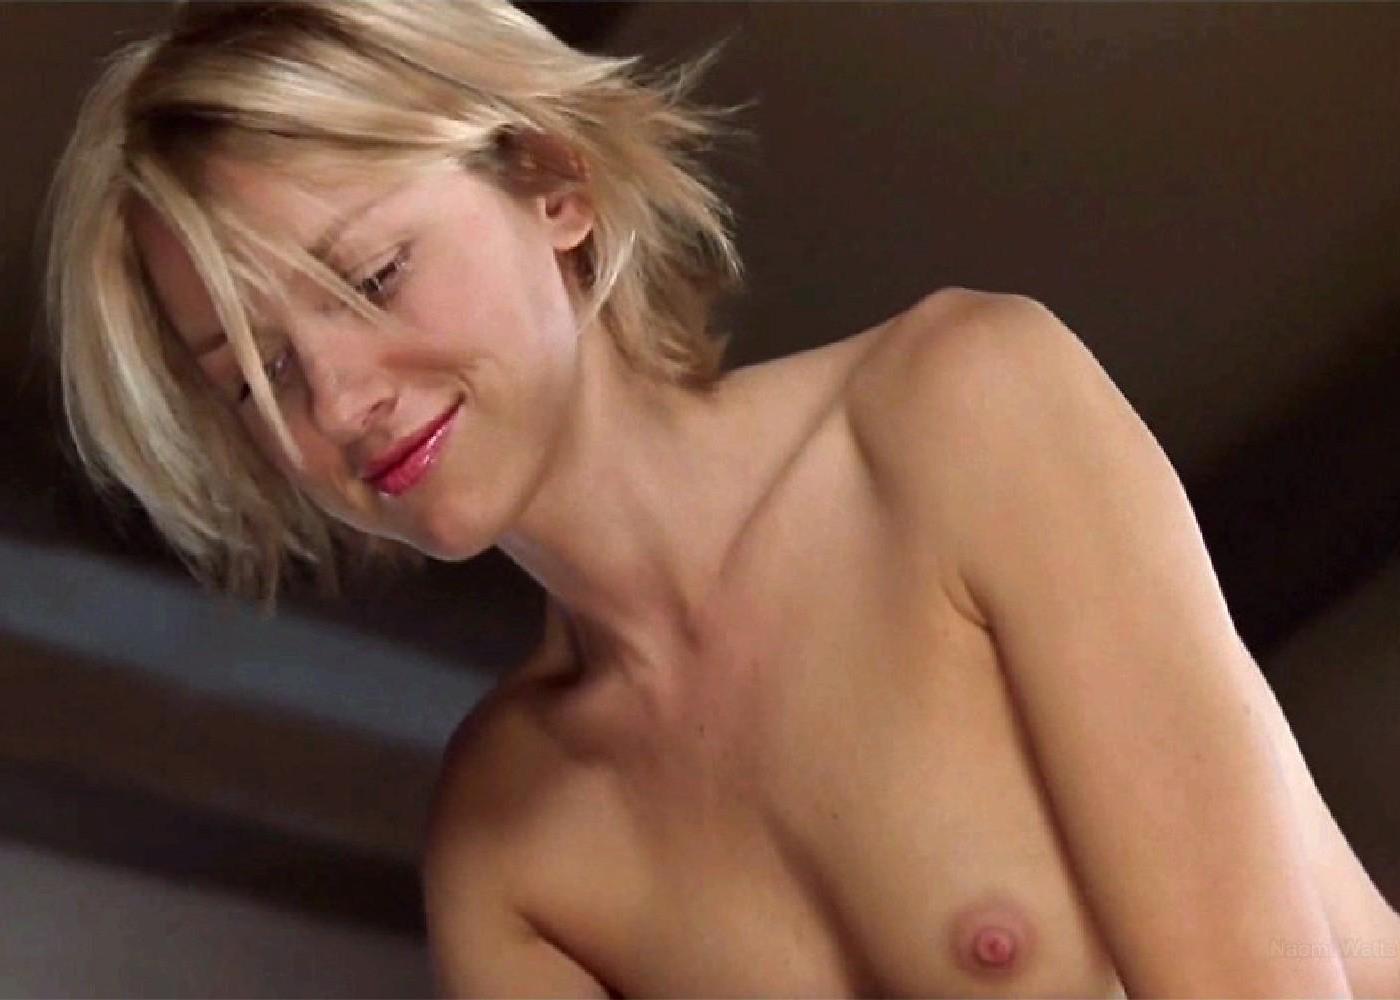 naomi-watts-fucks-white-indian-girl-nude